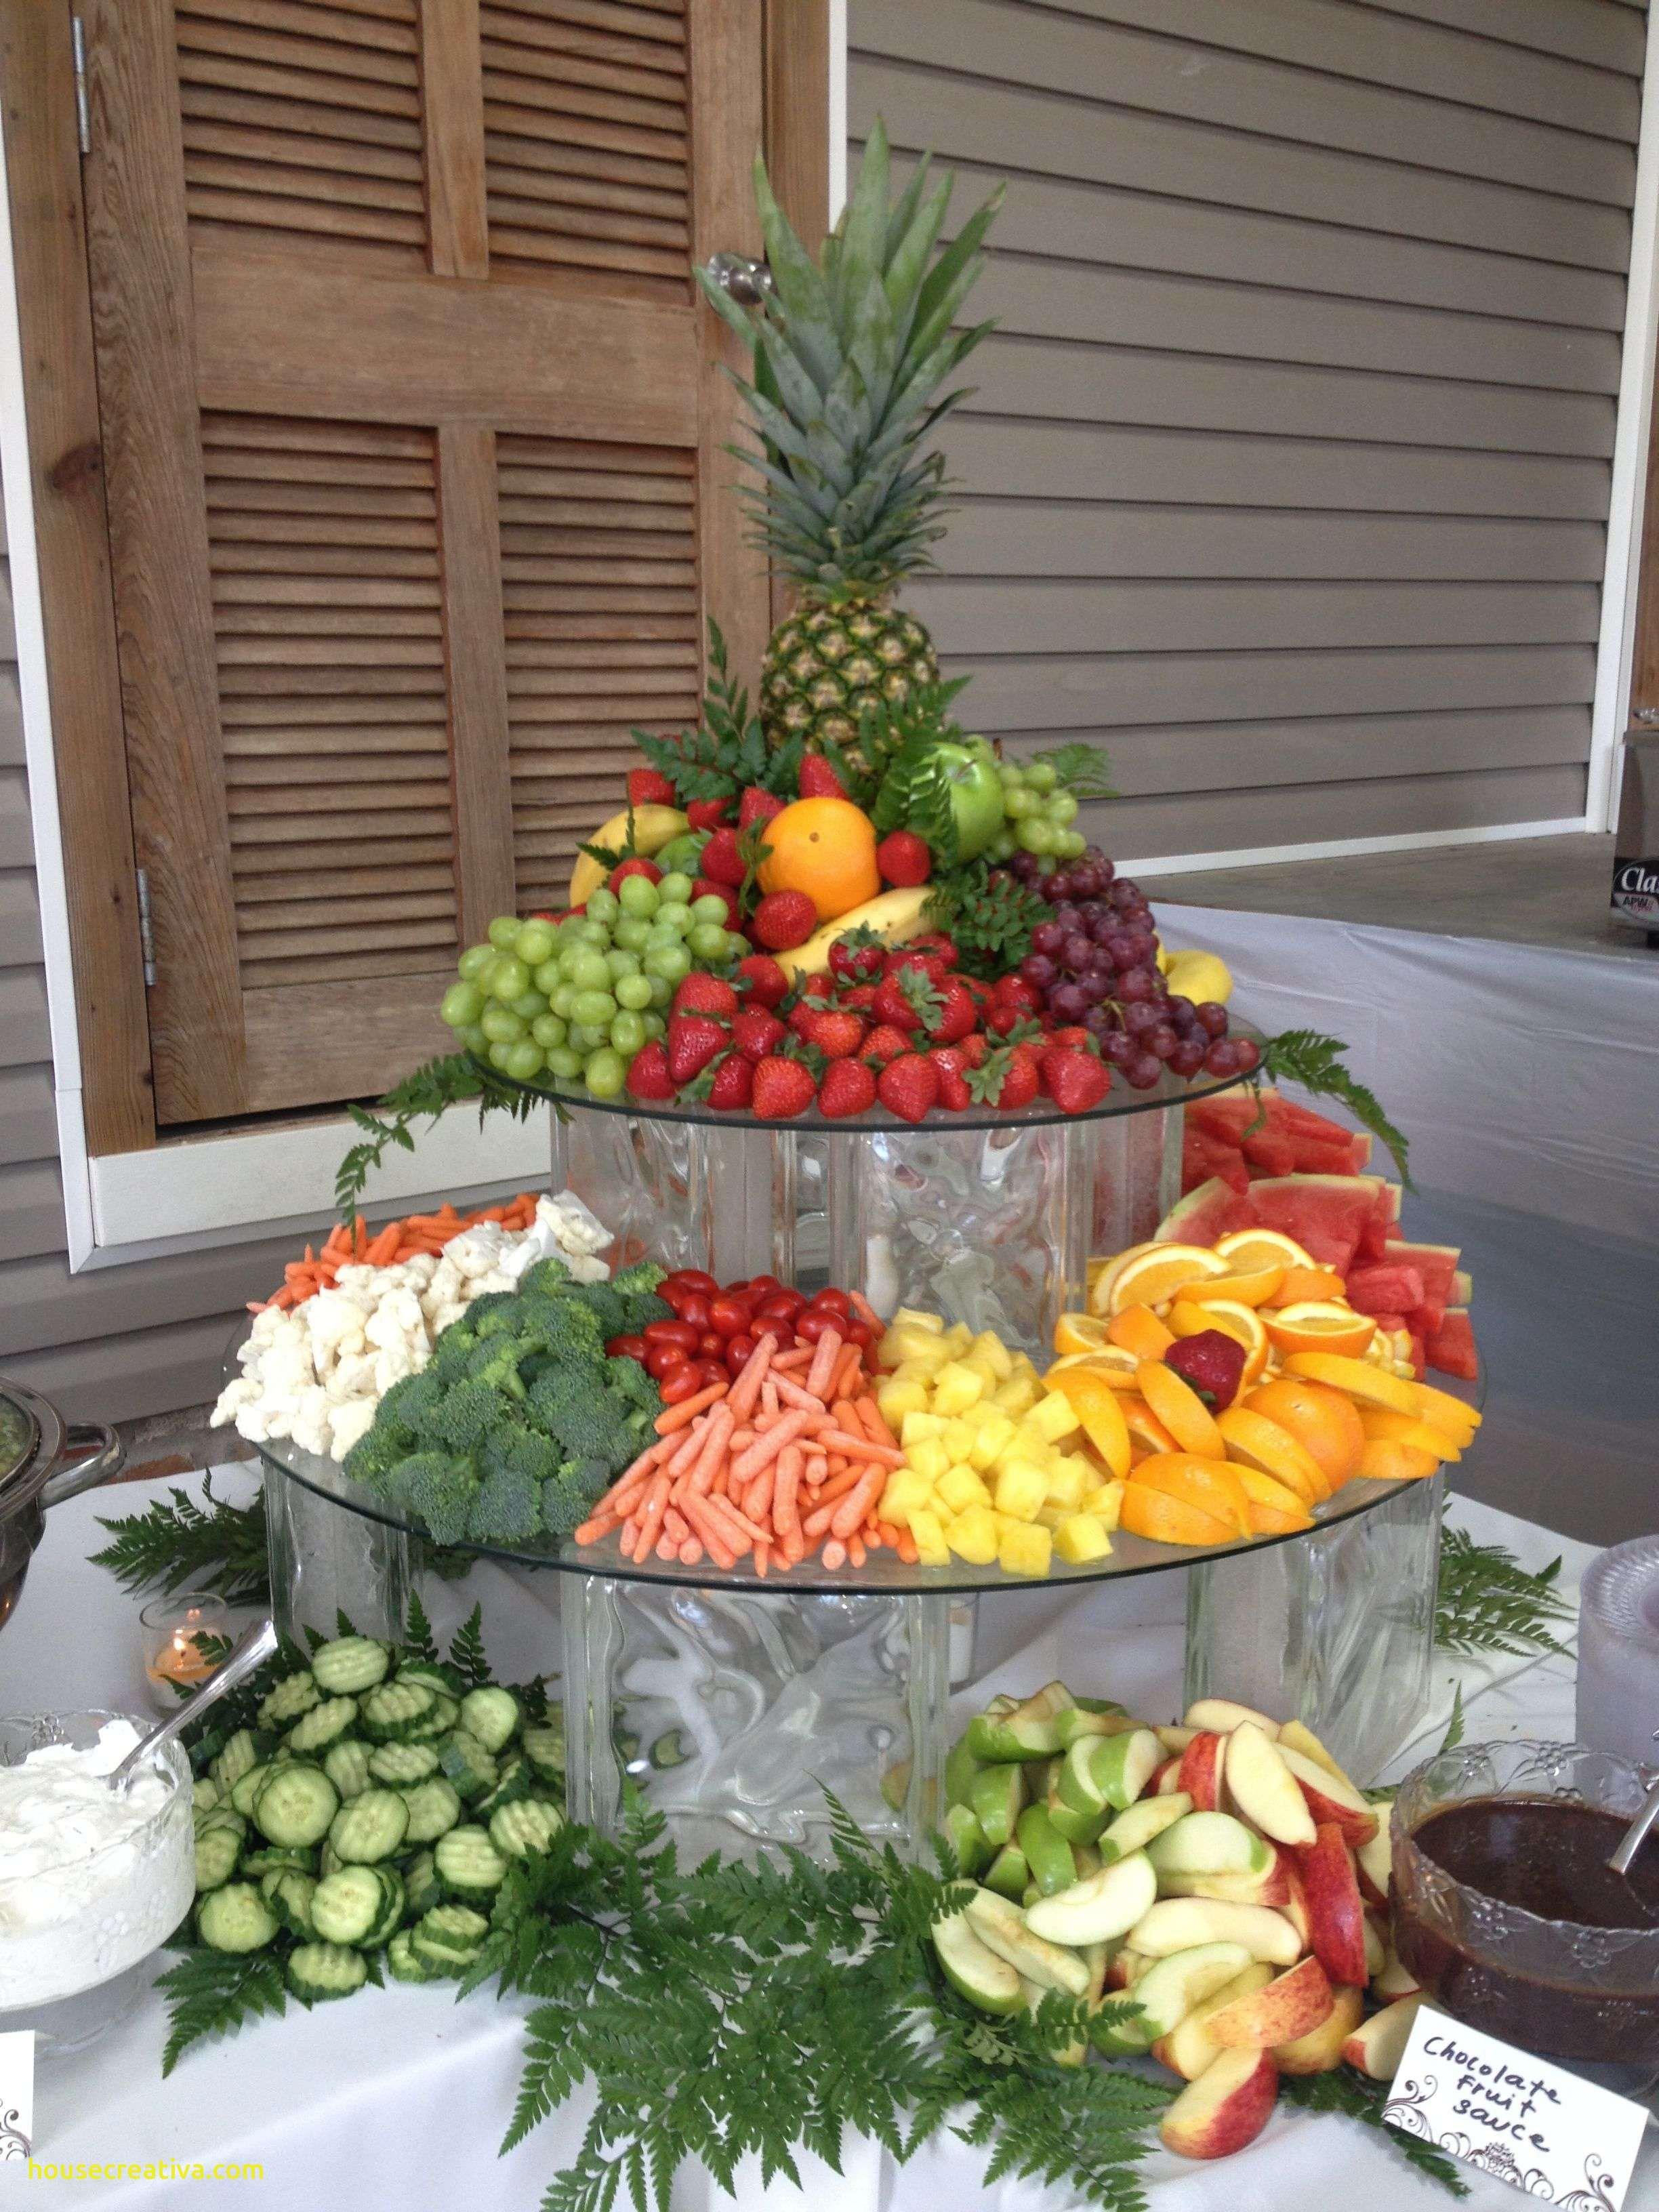 New Fruit Table Decorations For Weddings Homedecoration Homedecorations Homedecorationideas Homedecorationtrend Veggie Display Food Displays Wedding Food